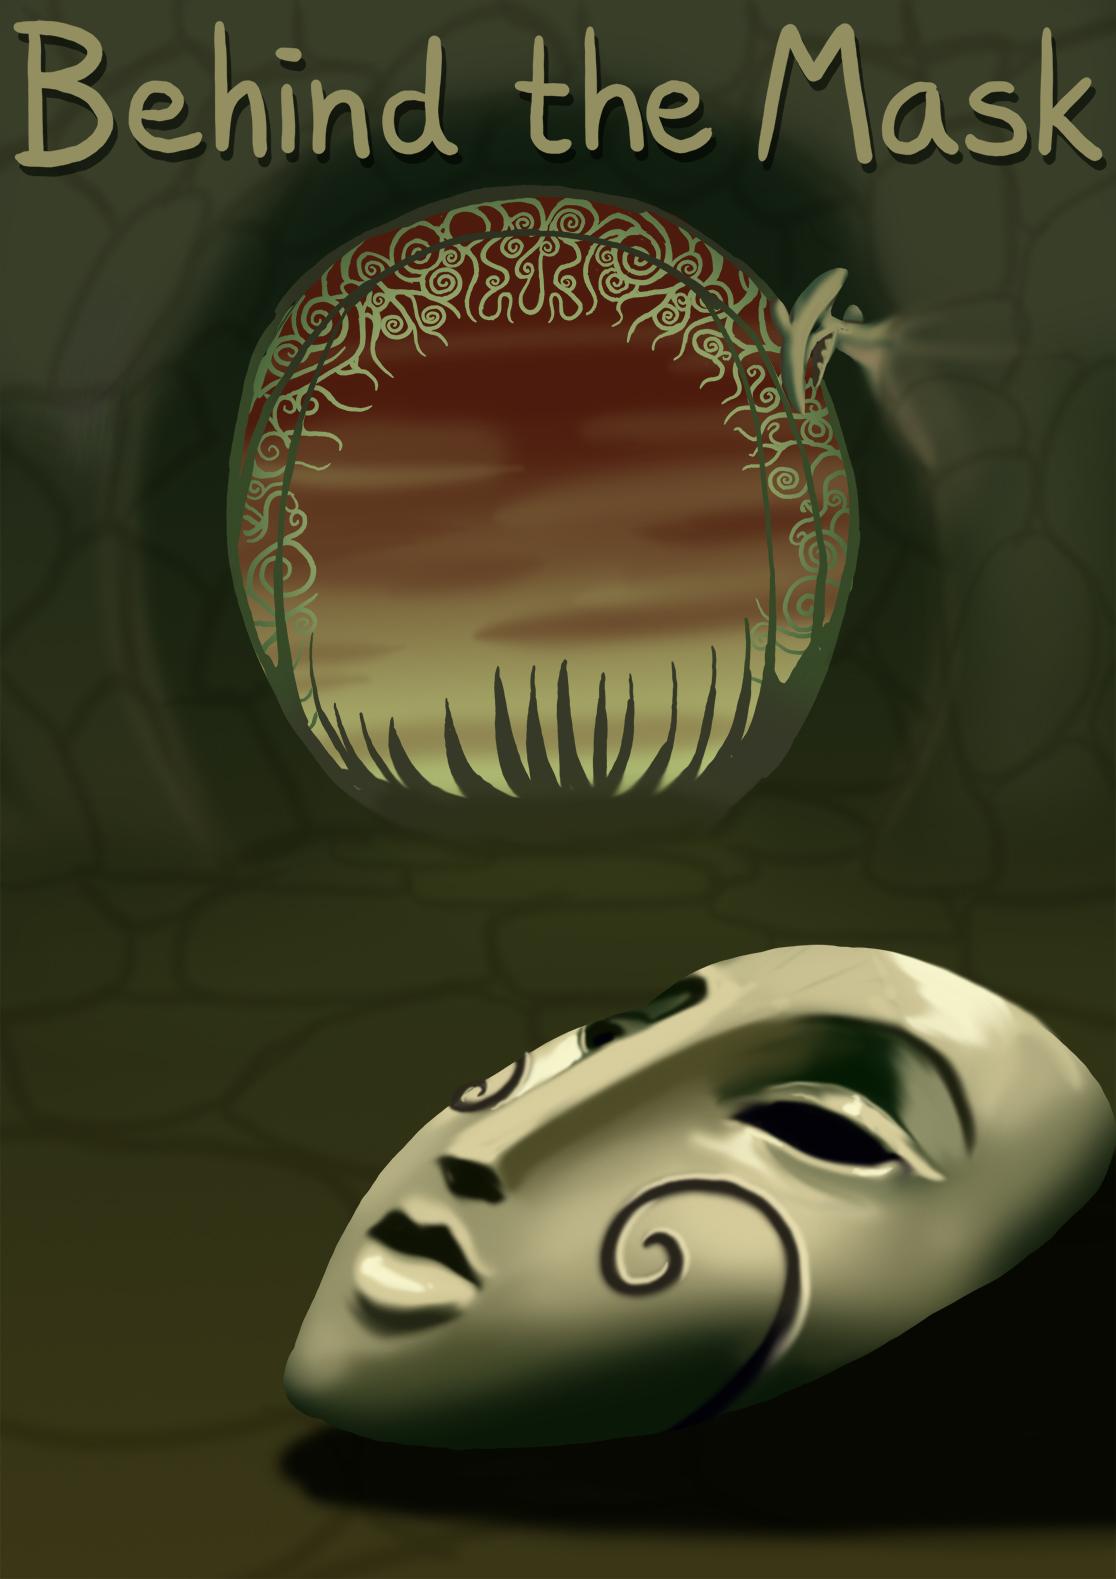 SureFap xxx porno Mia And Me - [DontFapGirl] - Chapter 2 - Behind the Mask